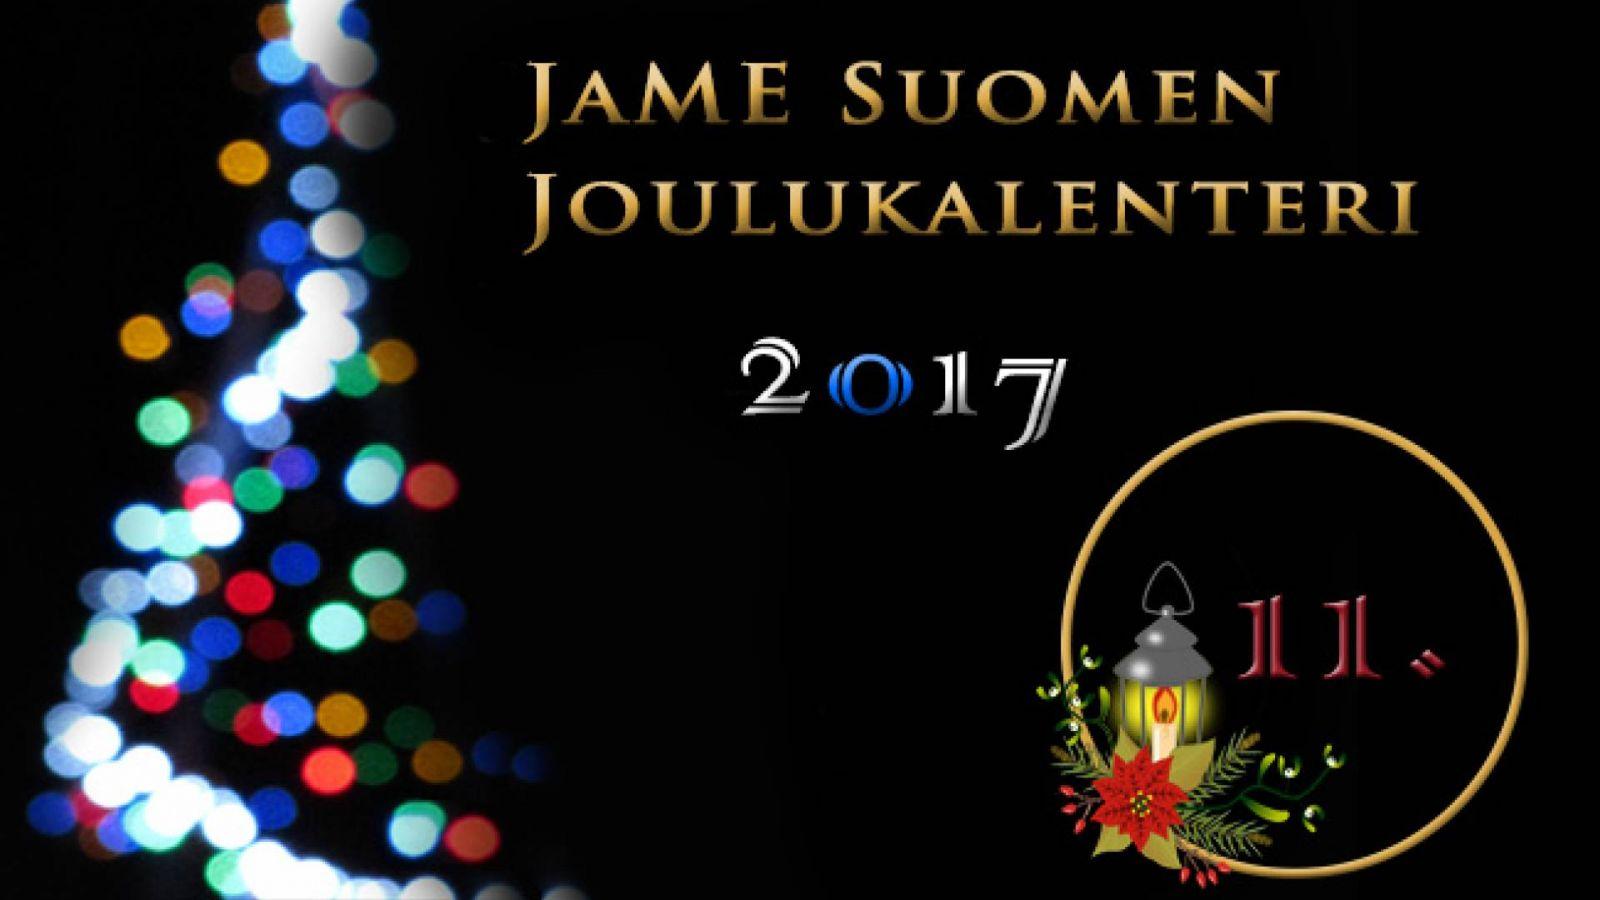 JaME Suomen joulukalenterin 11. luukku © Nipsu